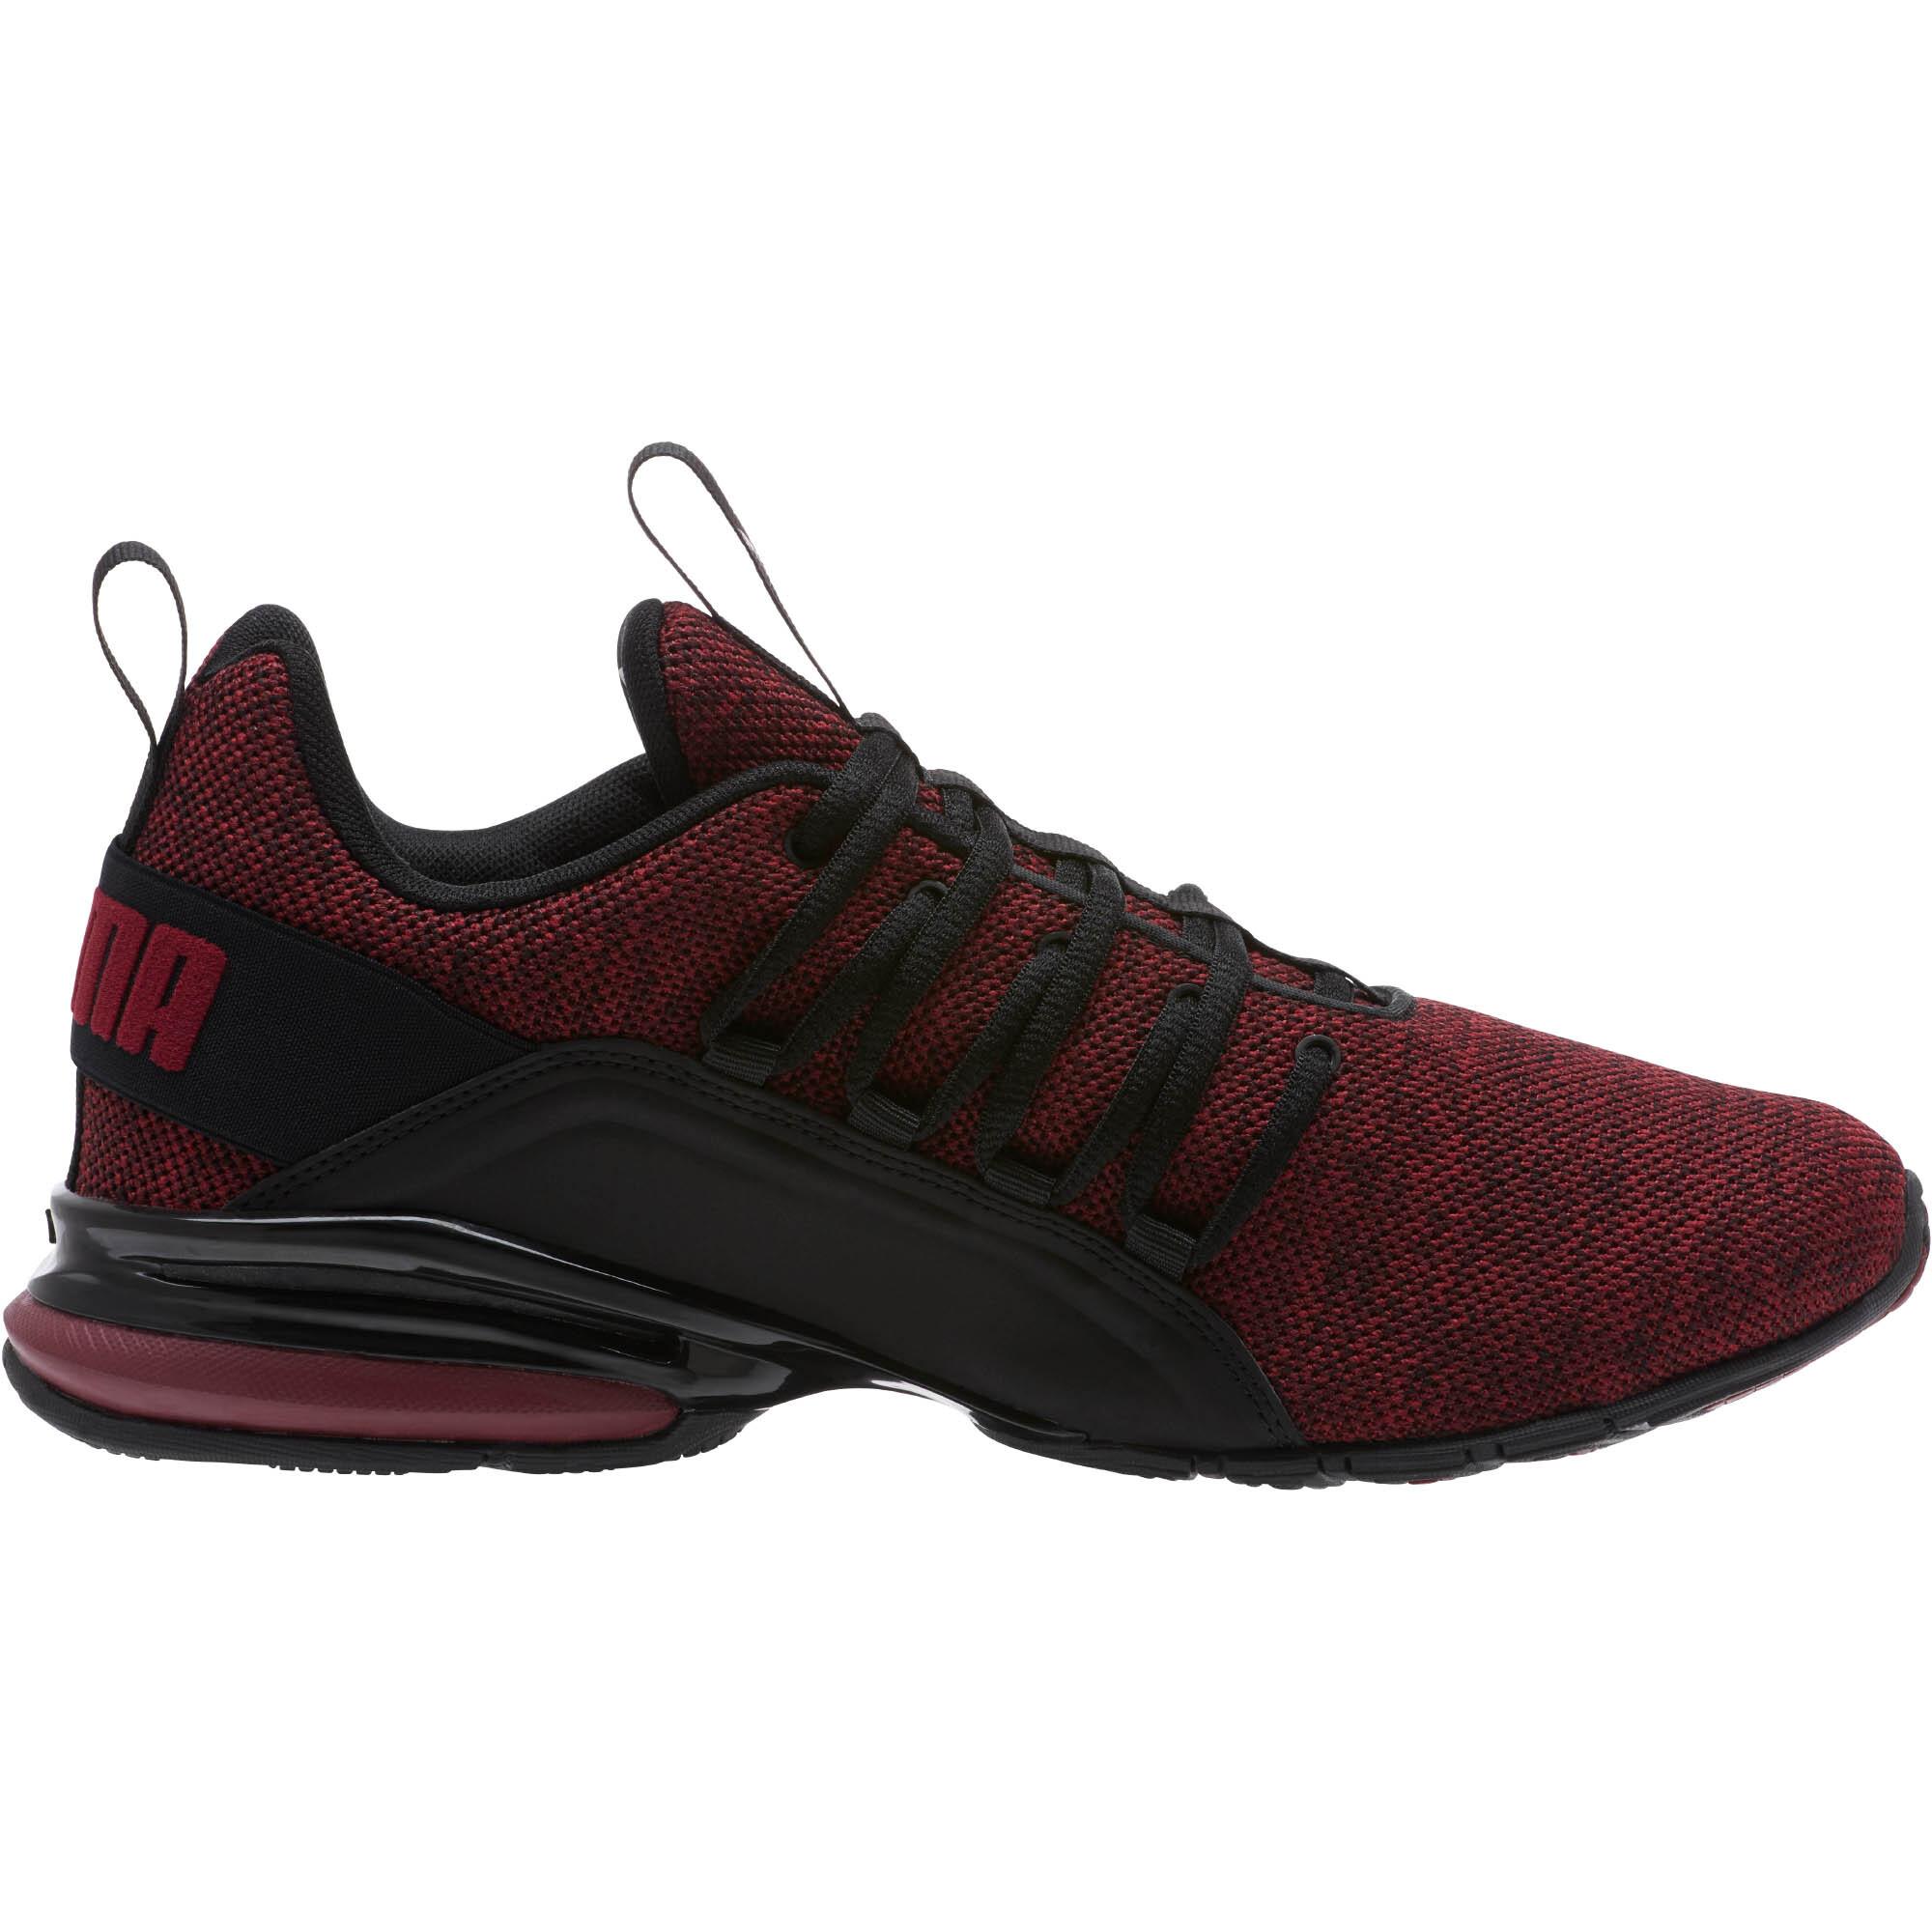 PUMA-Axelion-Men-039-s-Training-Shoes-Men-Shoe-Running thumbnail 30